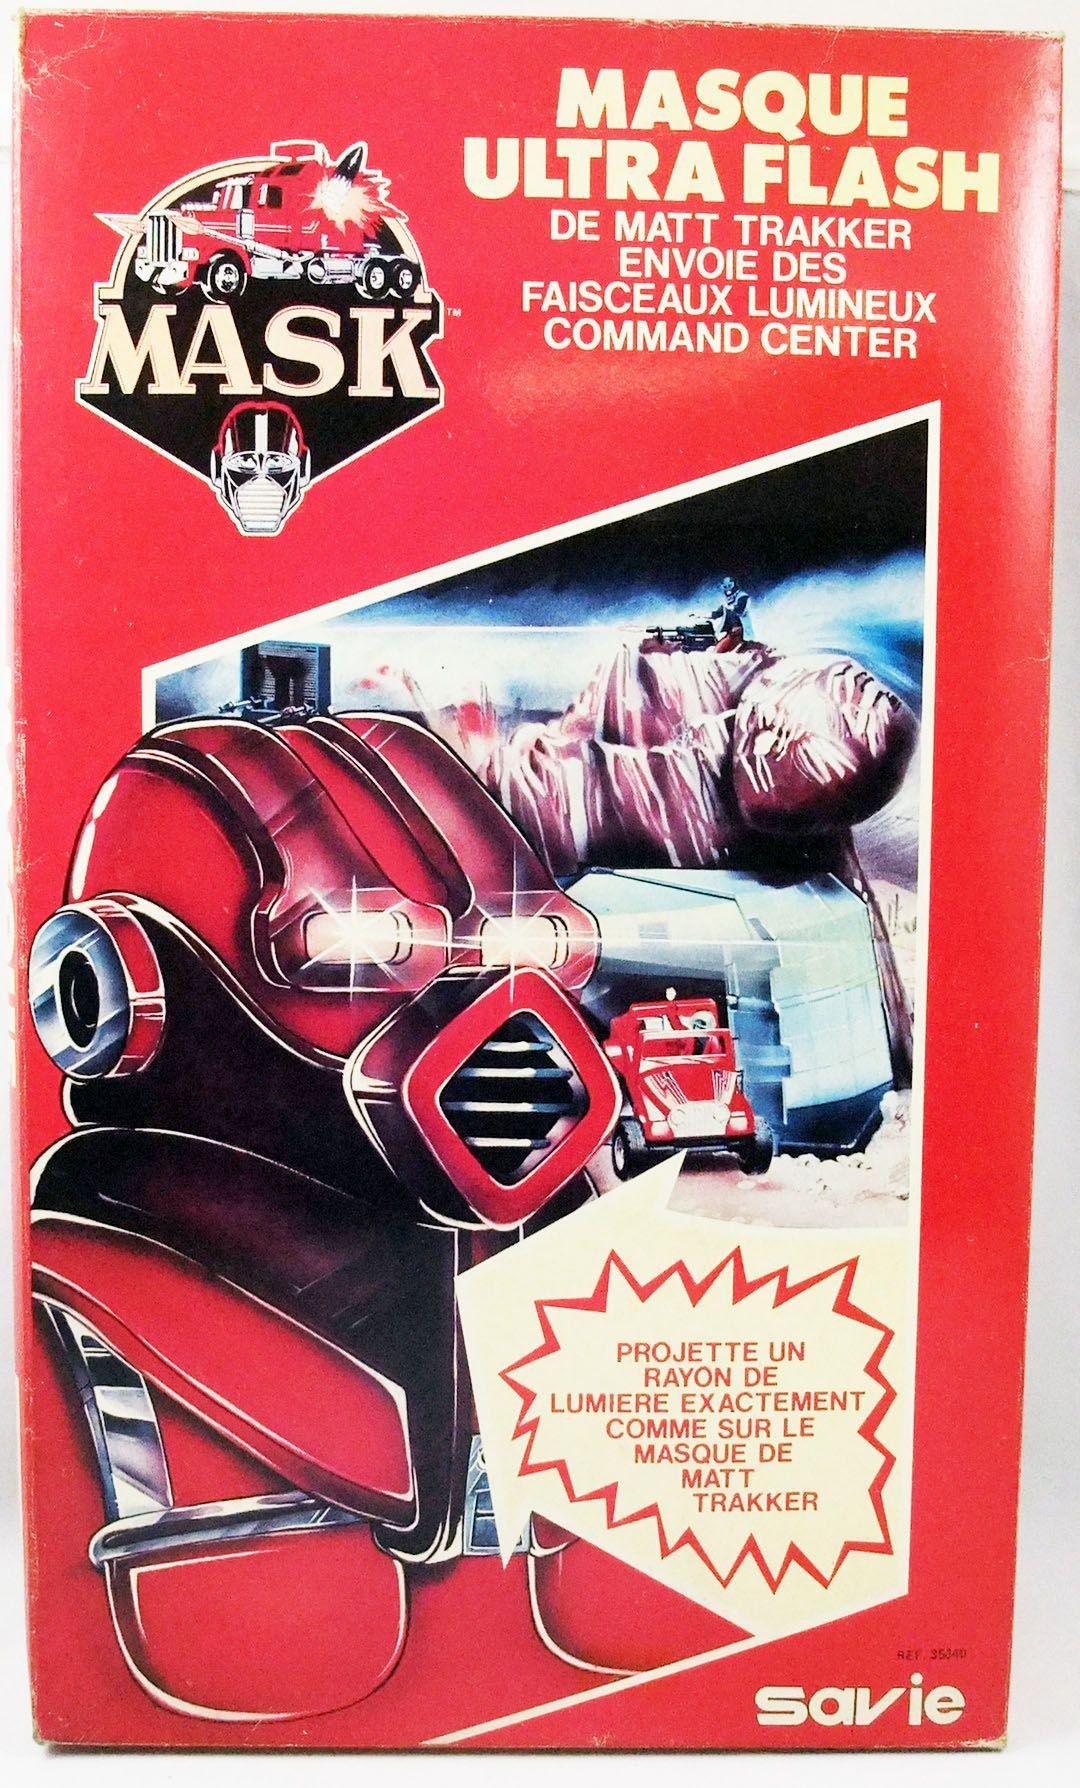 M.A.S.K. - Masque Ultra Flash - Savie (neuf en boite)